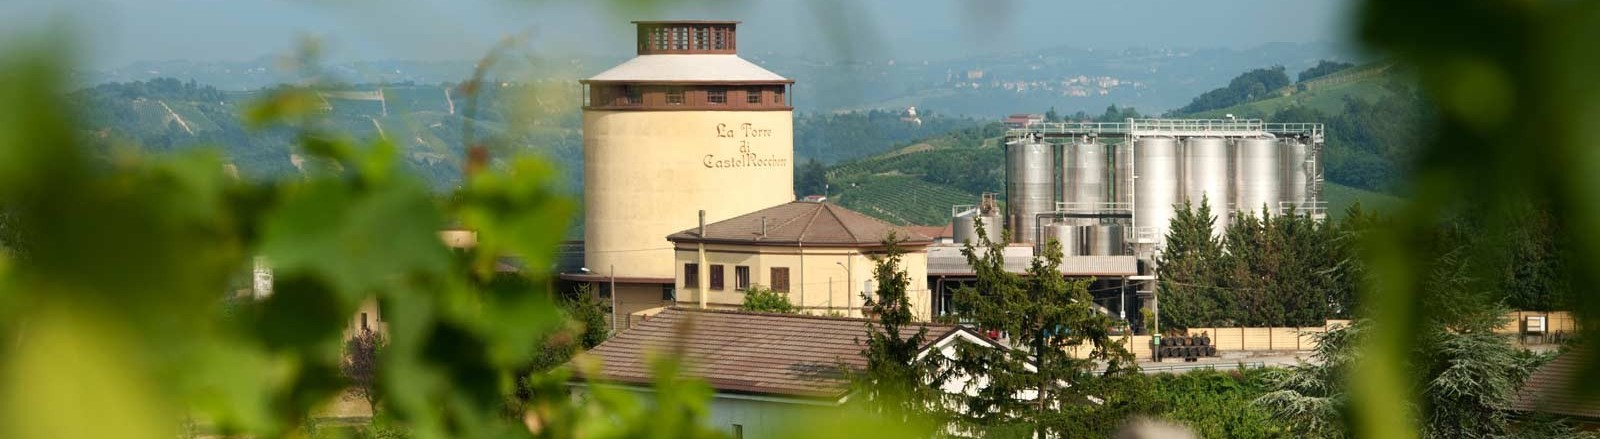 Torre Vinaria di Castel Rocchero